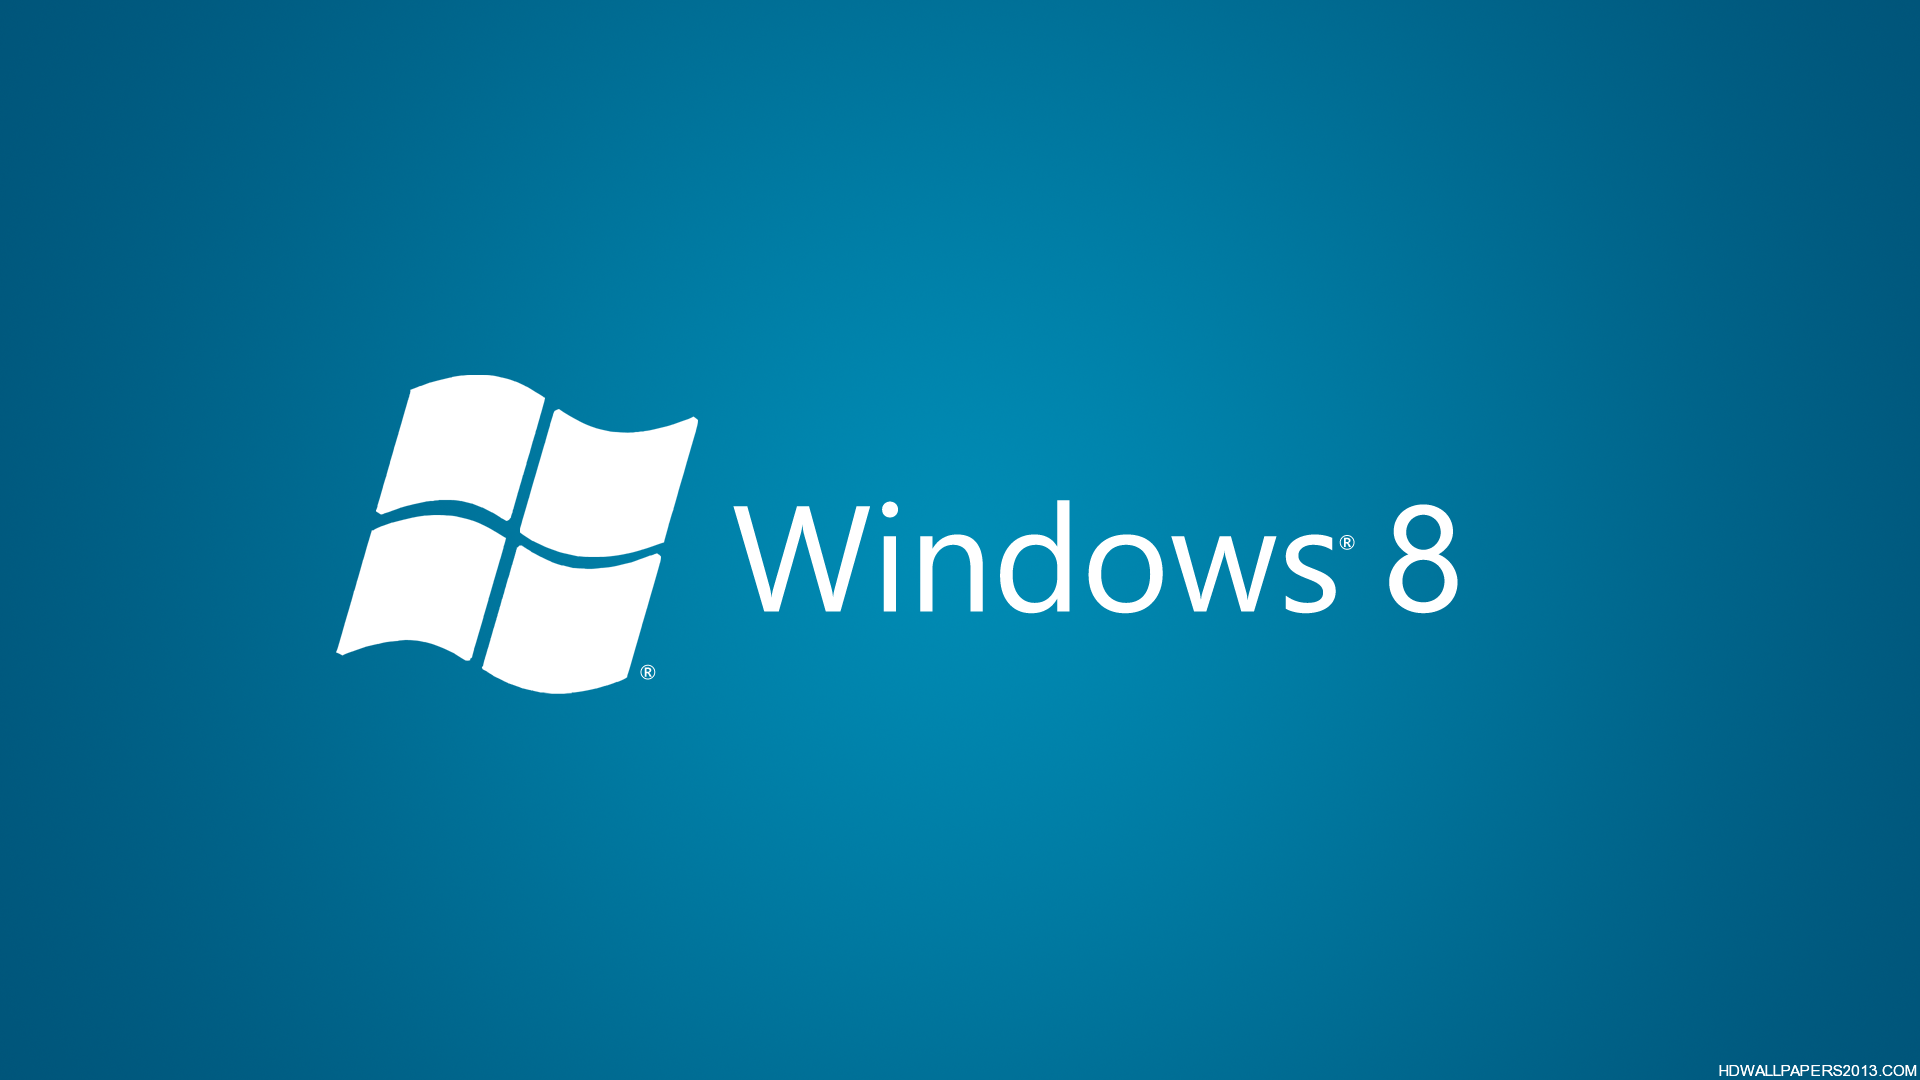 Windows 8 Wallpaper HD wallpaper   1011343 1920x1080